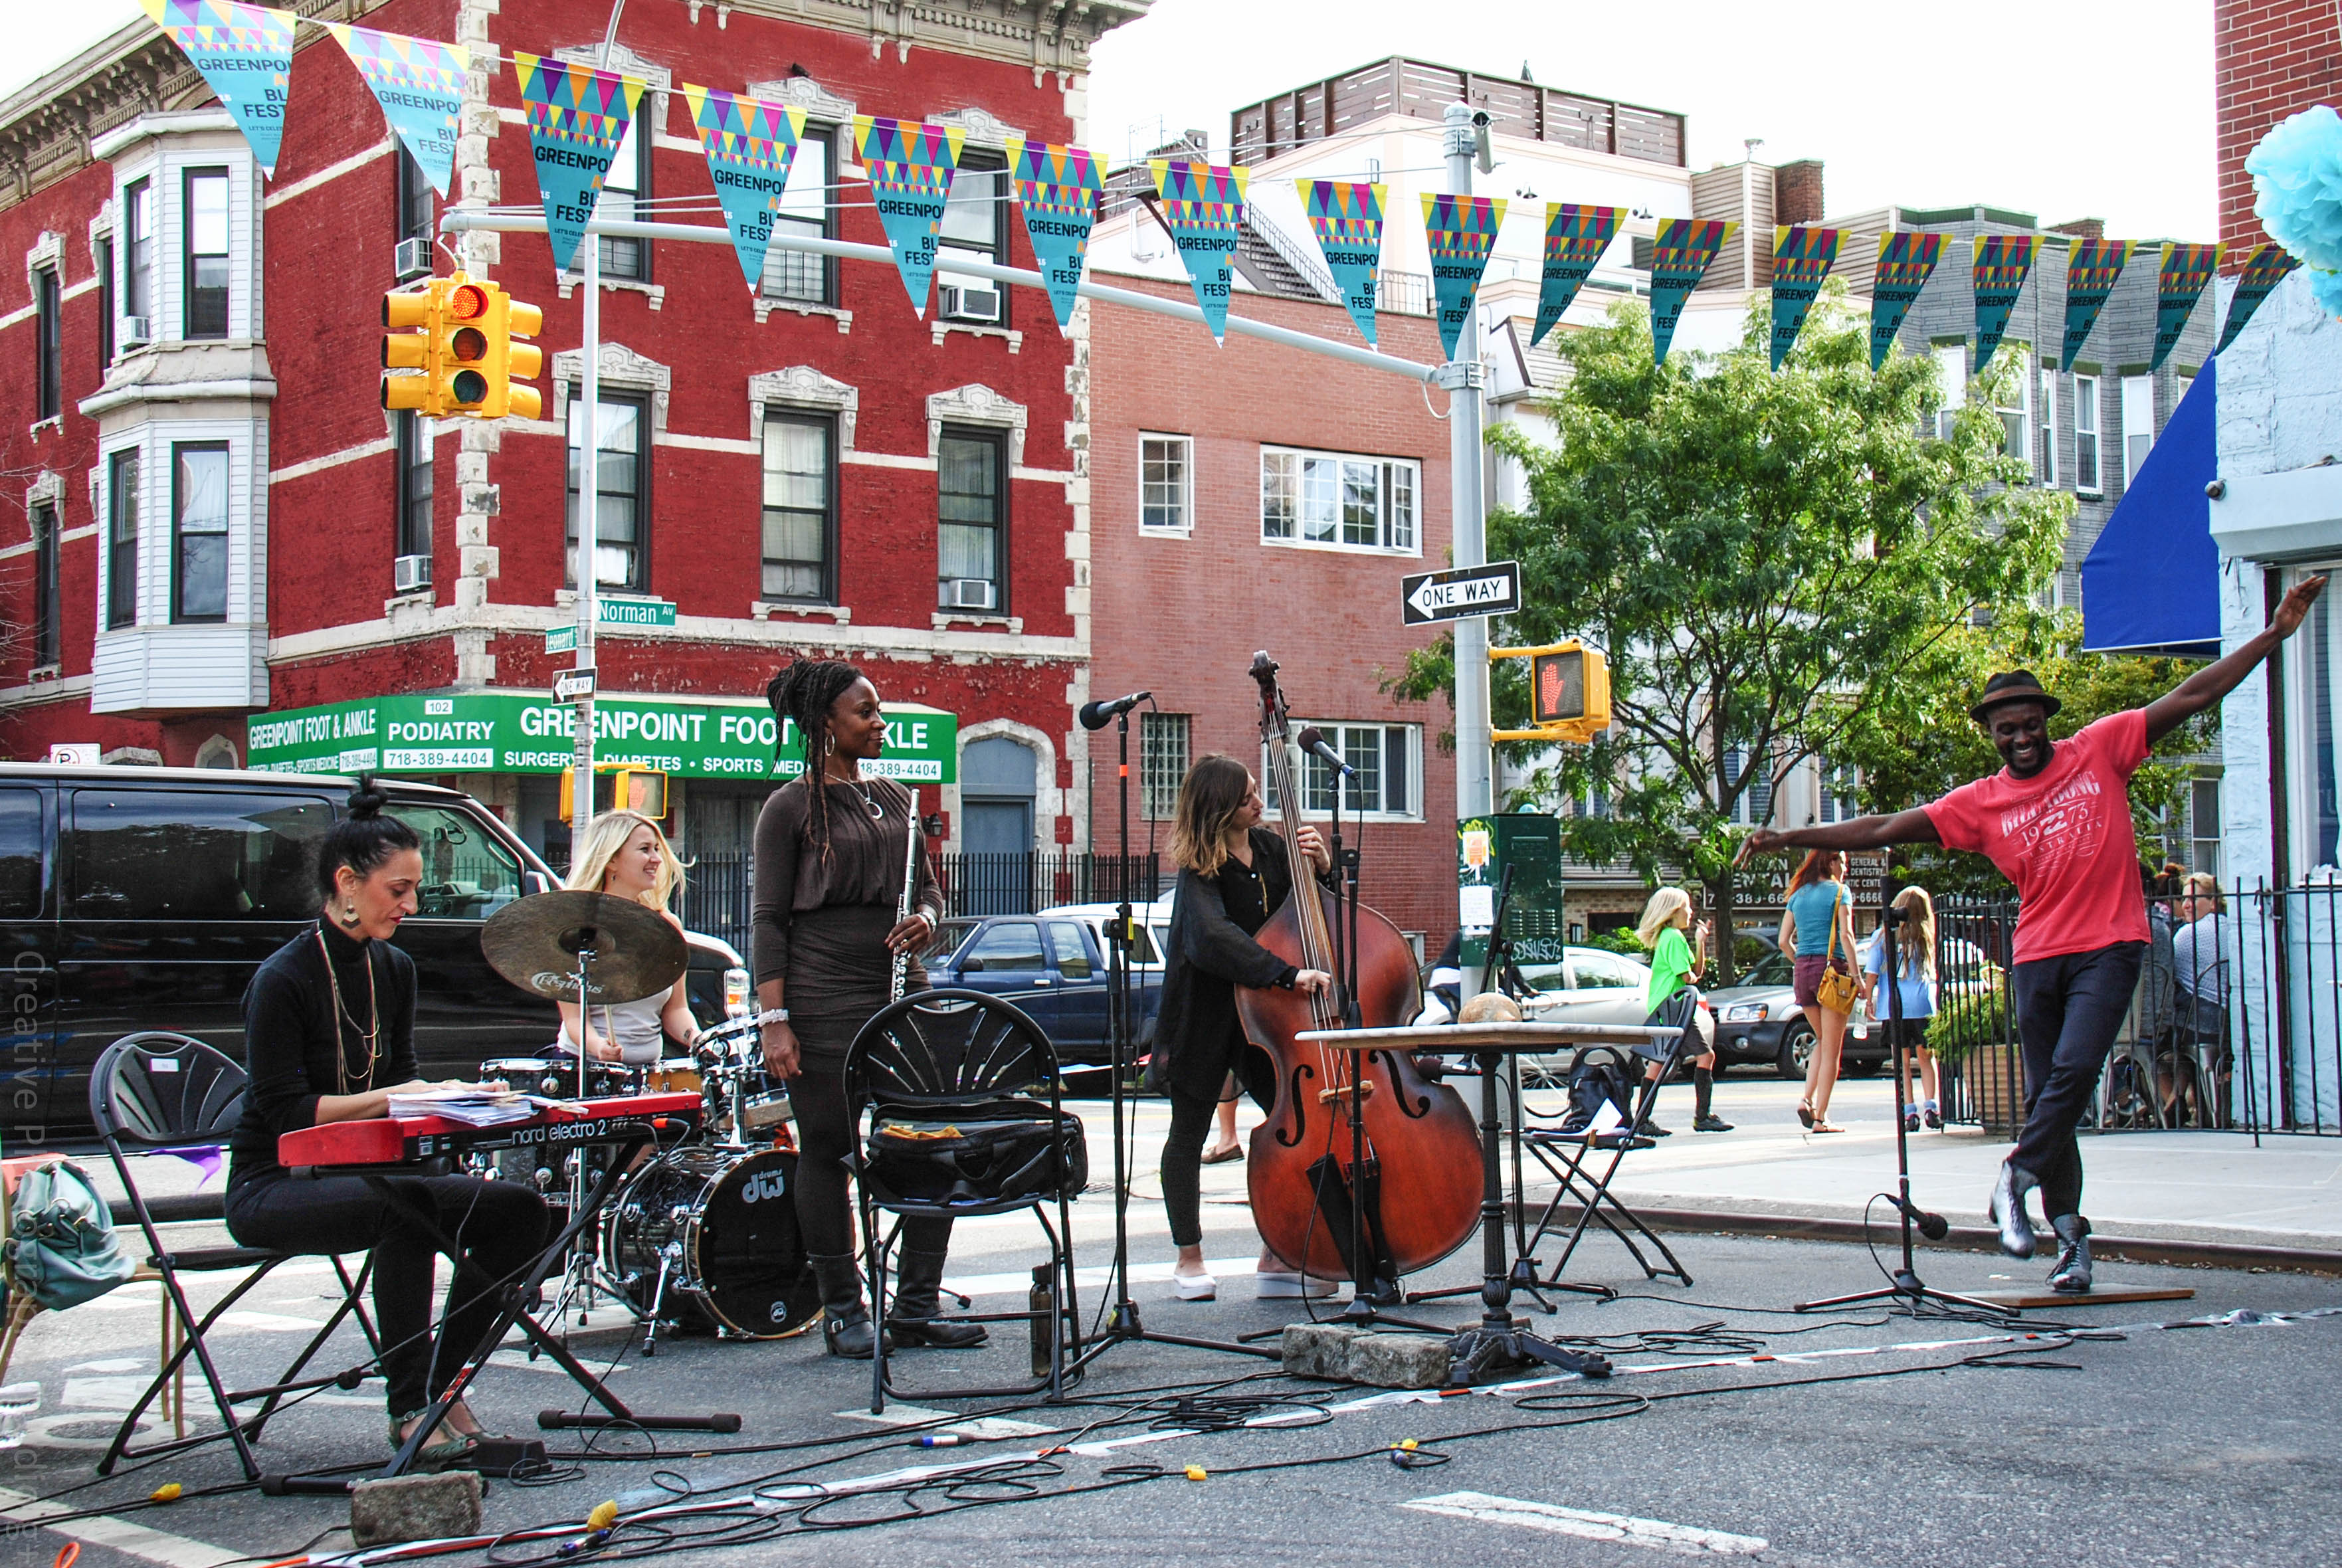 Święto Greenpointu – festiwal ulicy